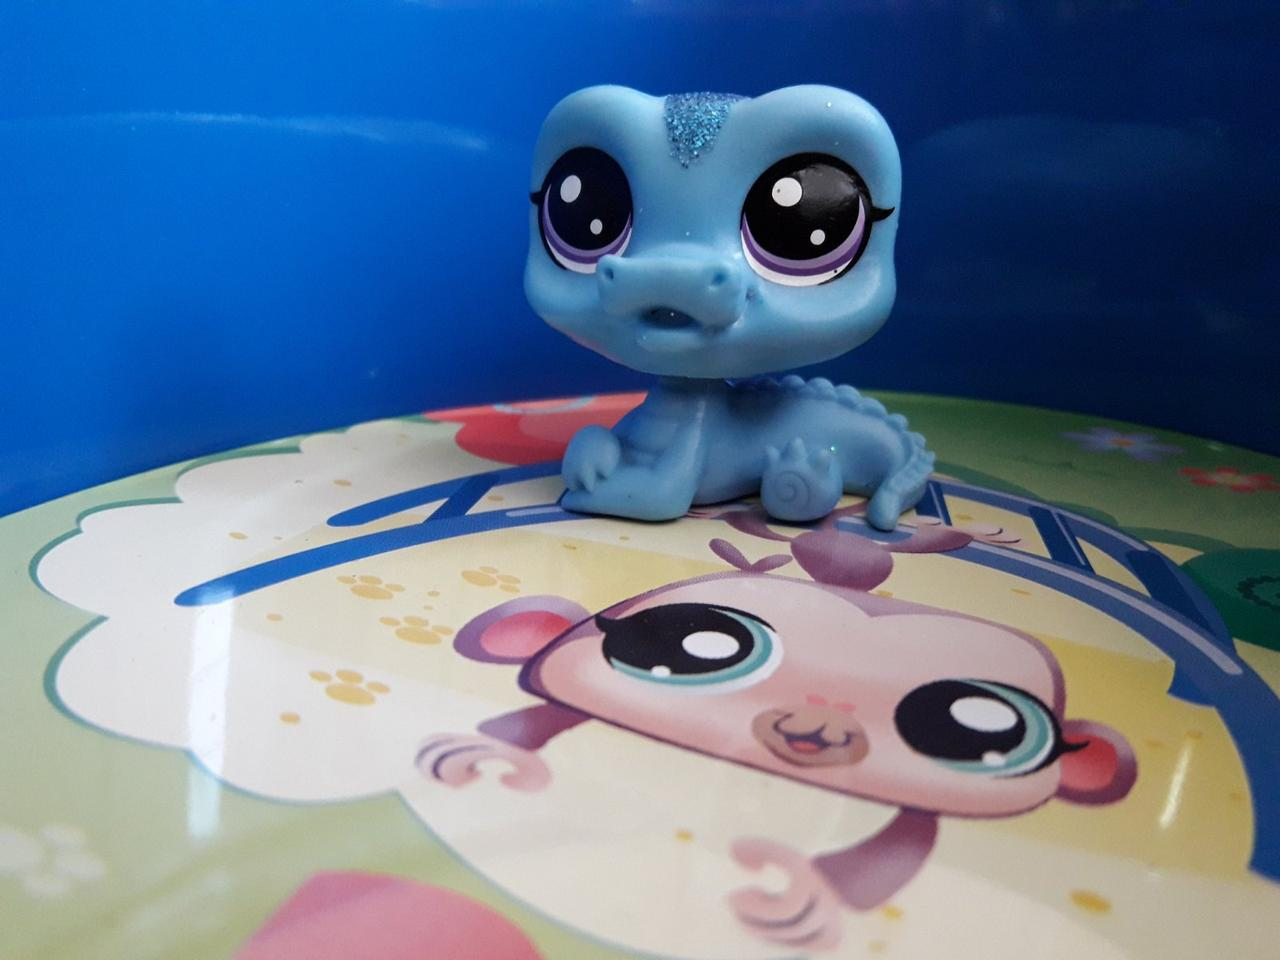 Littlest pet shop lps игрушка Hasbro лпс пет шоп крокодил sleek gatori